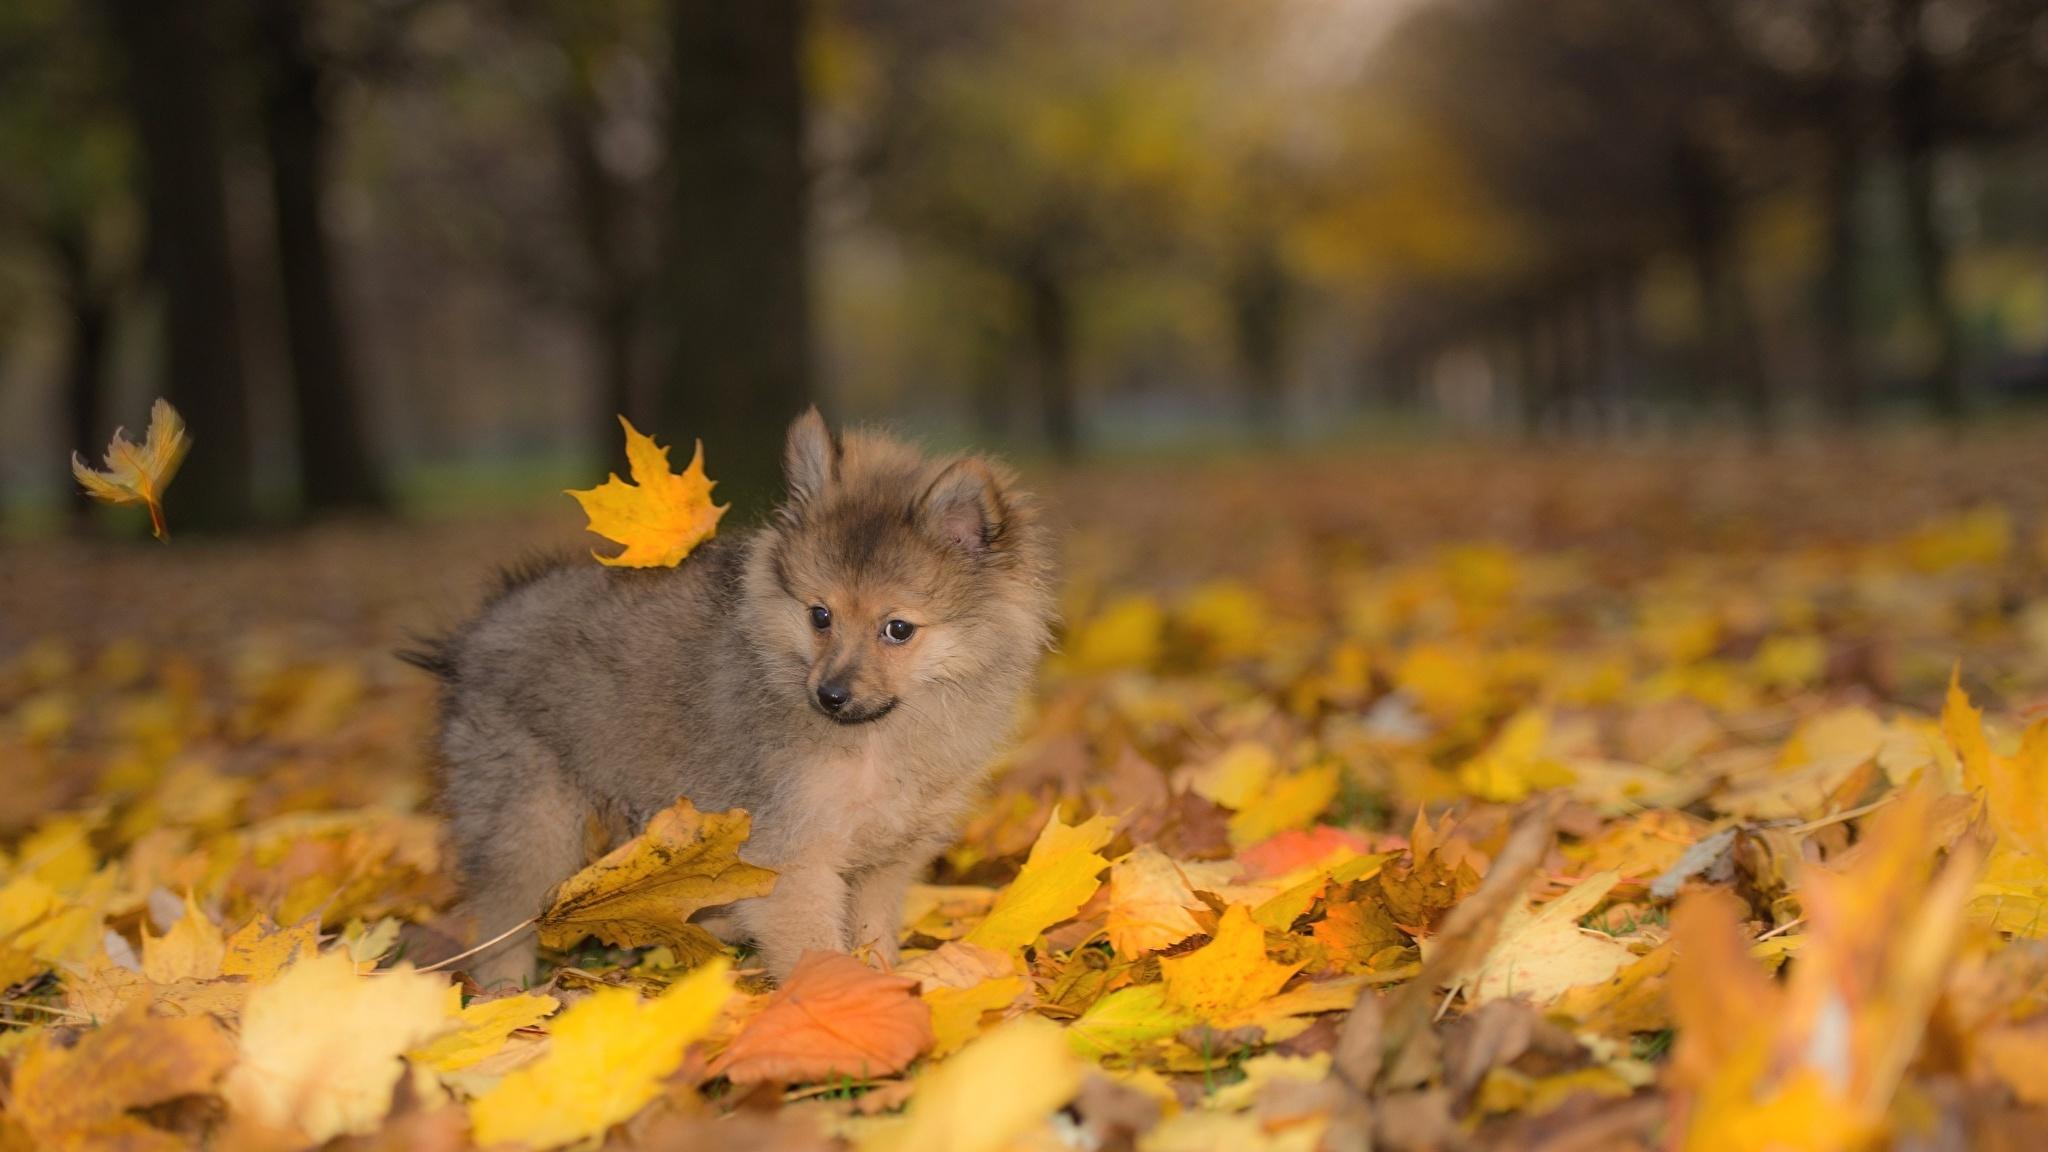 Animal In Autumn best wallpaper